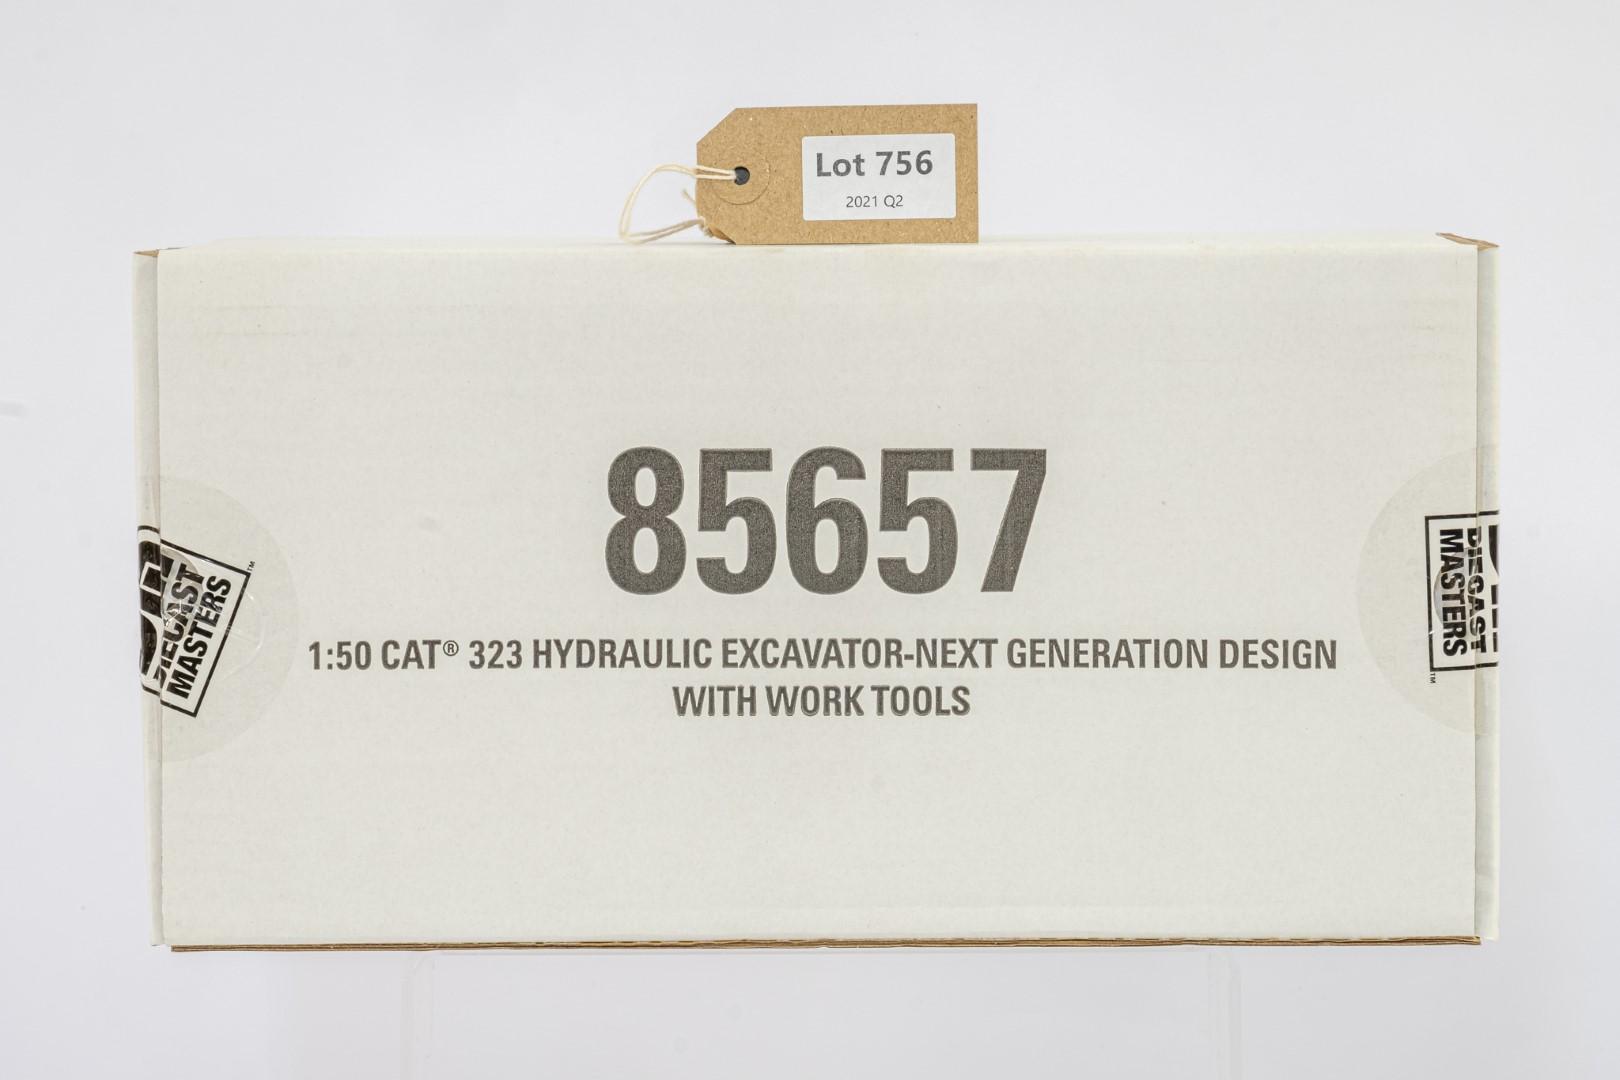 Diecast Masters CAT 323 Hydraulic Excavator Next Generation Design with work tools - Sealed Box